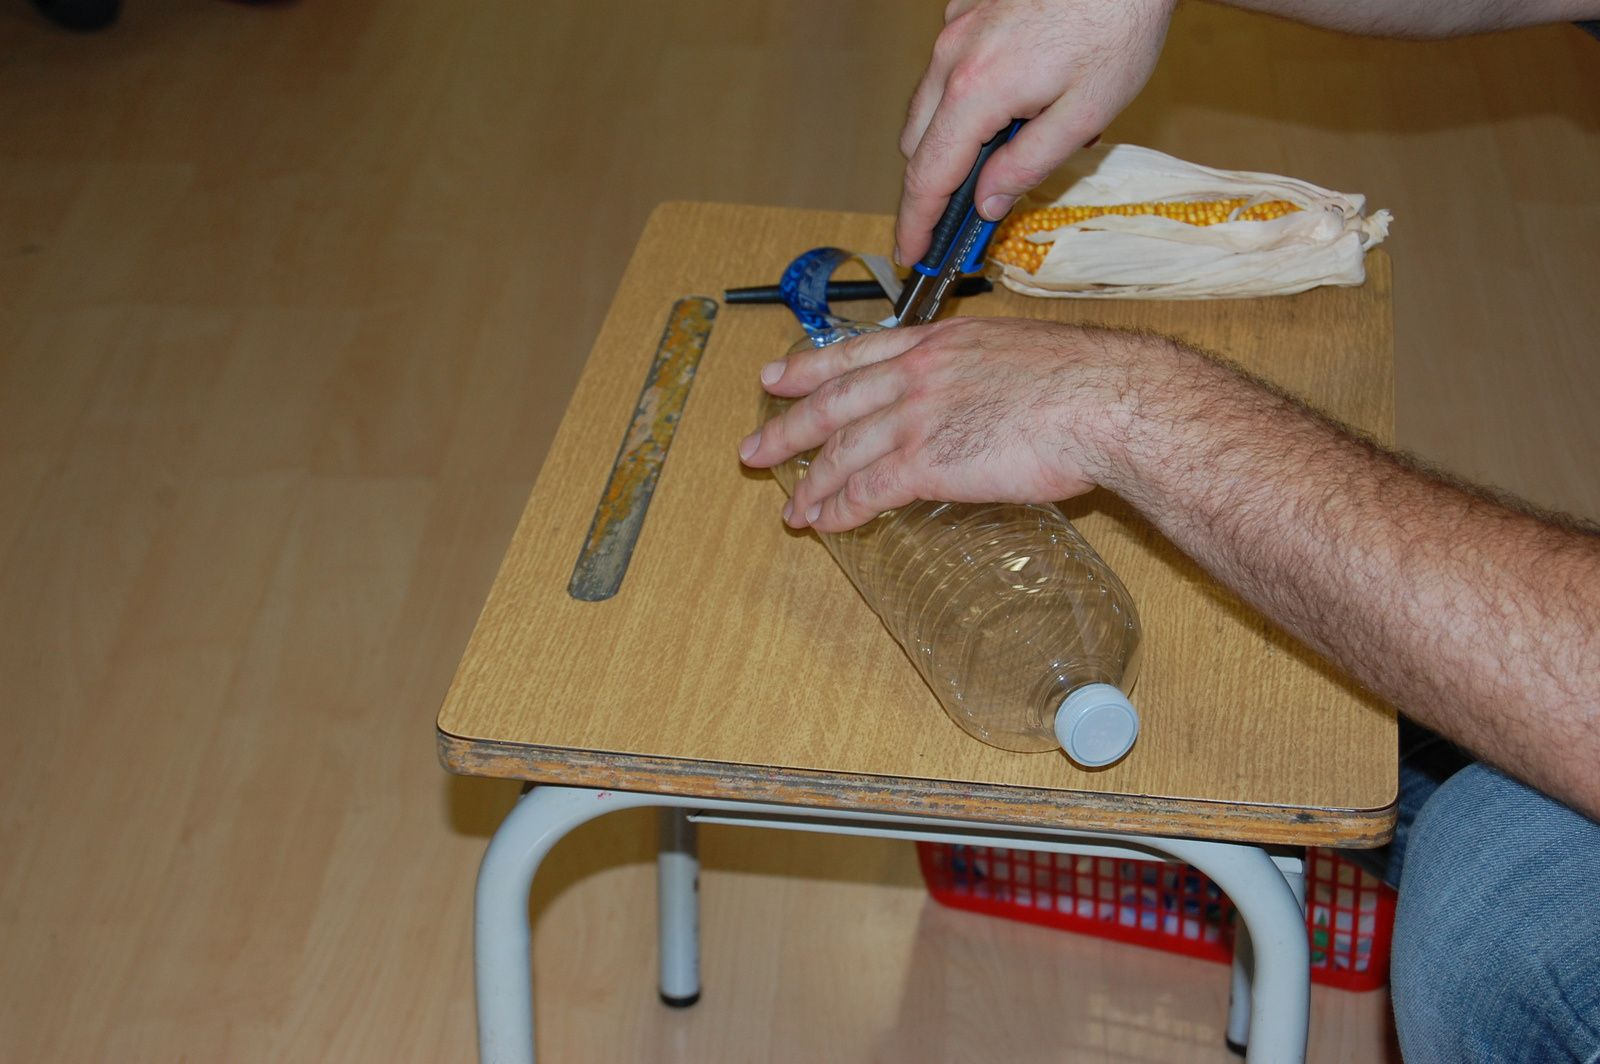 fabrication des mangeoires oiseaux le blog de l 39 cole allende sainghin en weppes. Black Bedroom Furniture Sets. Home Design Ideas